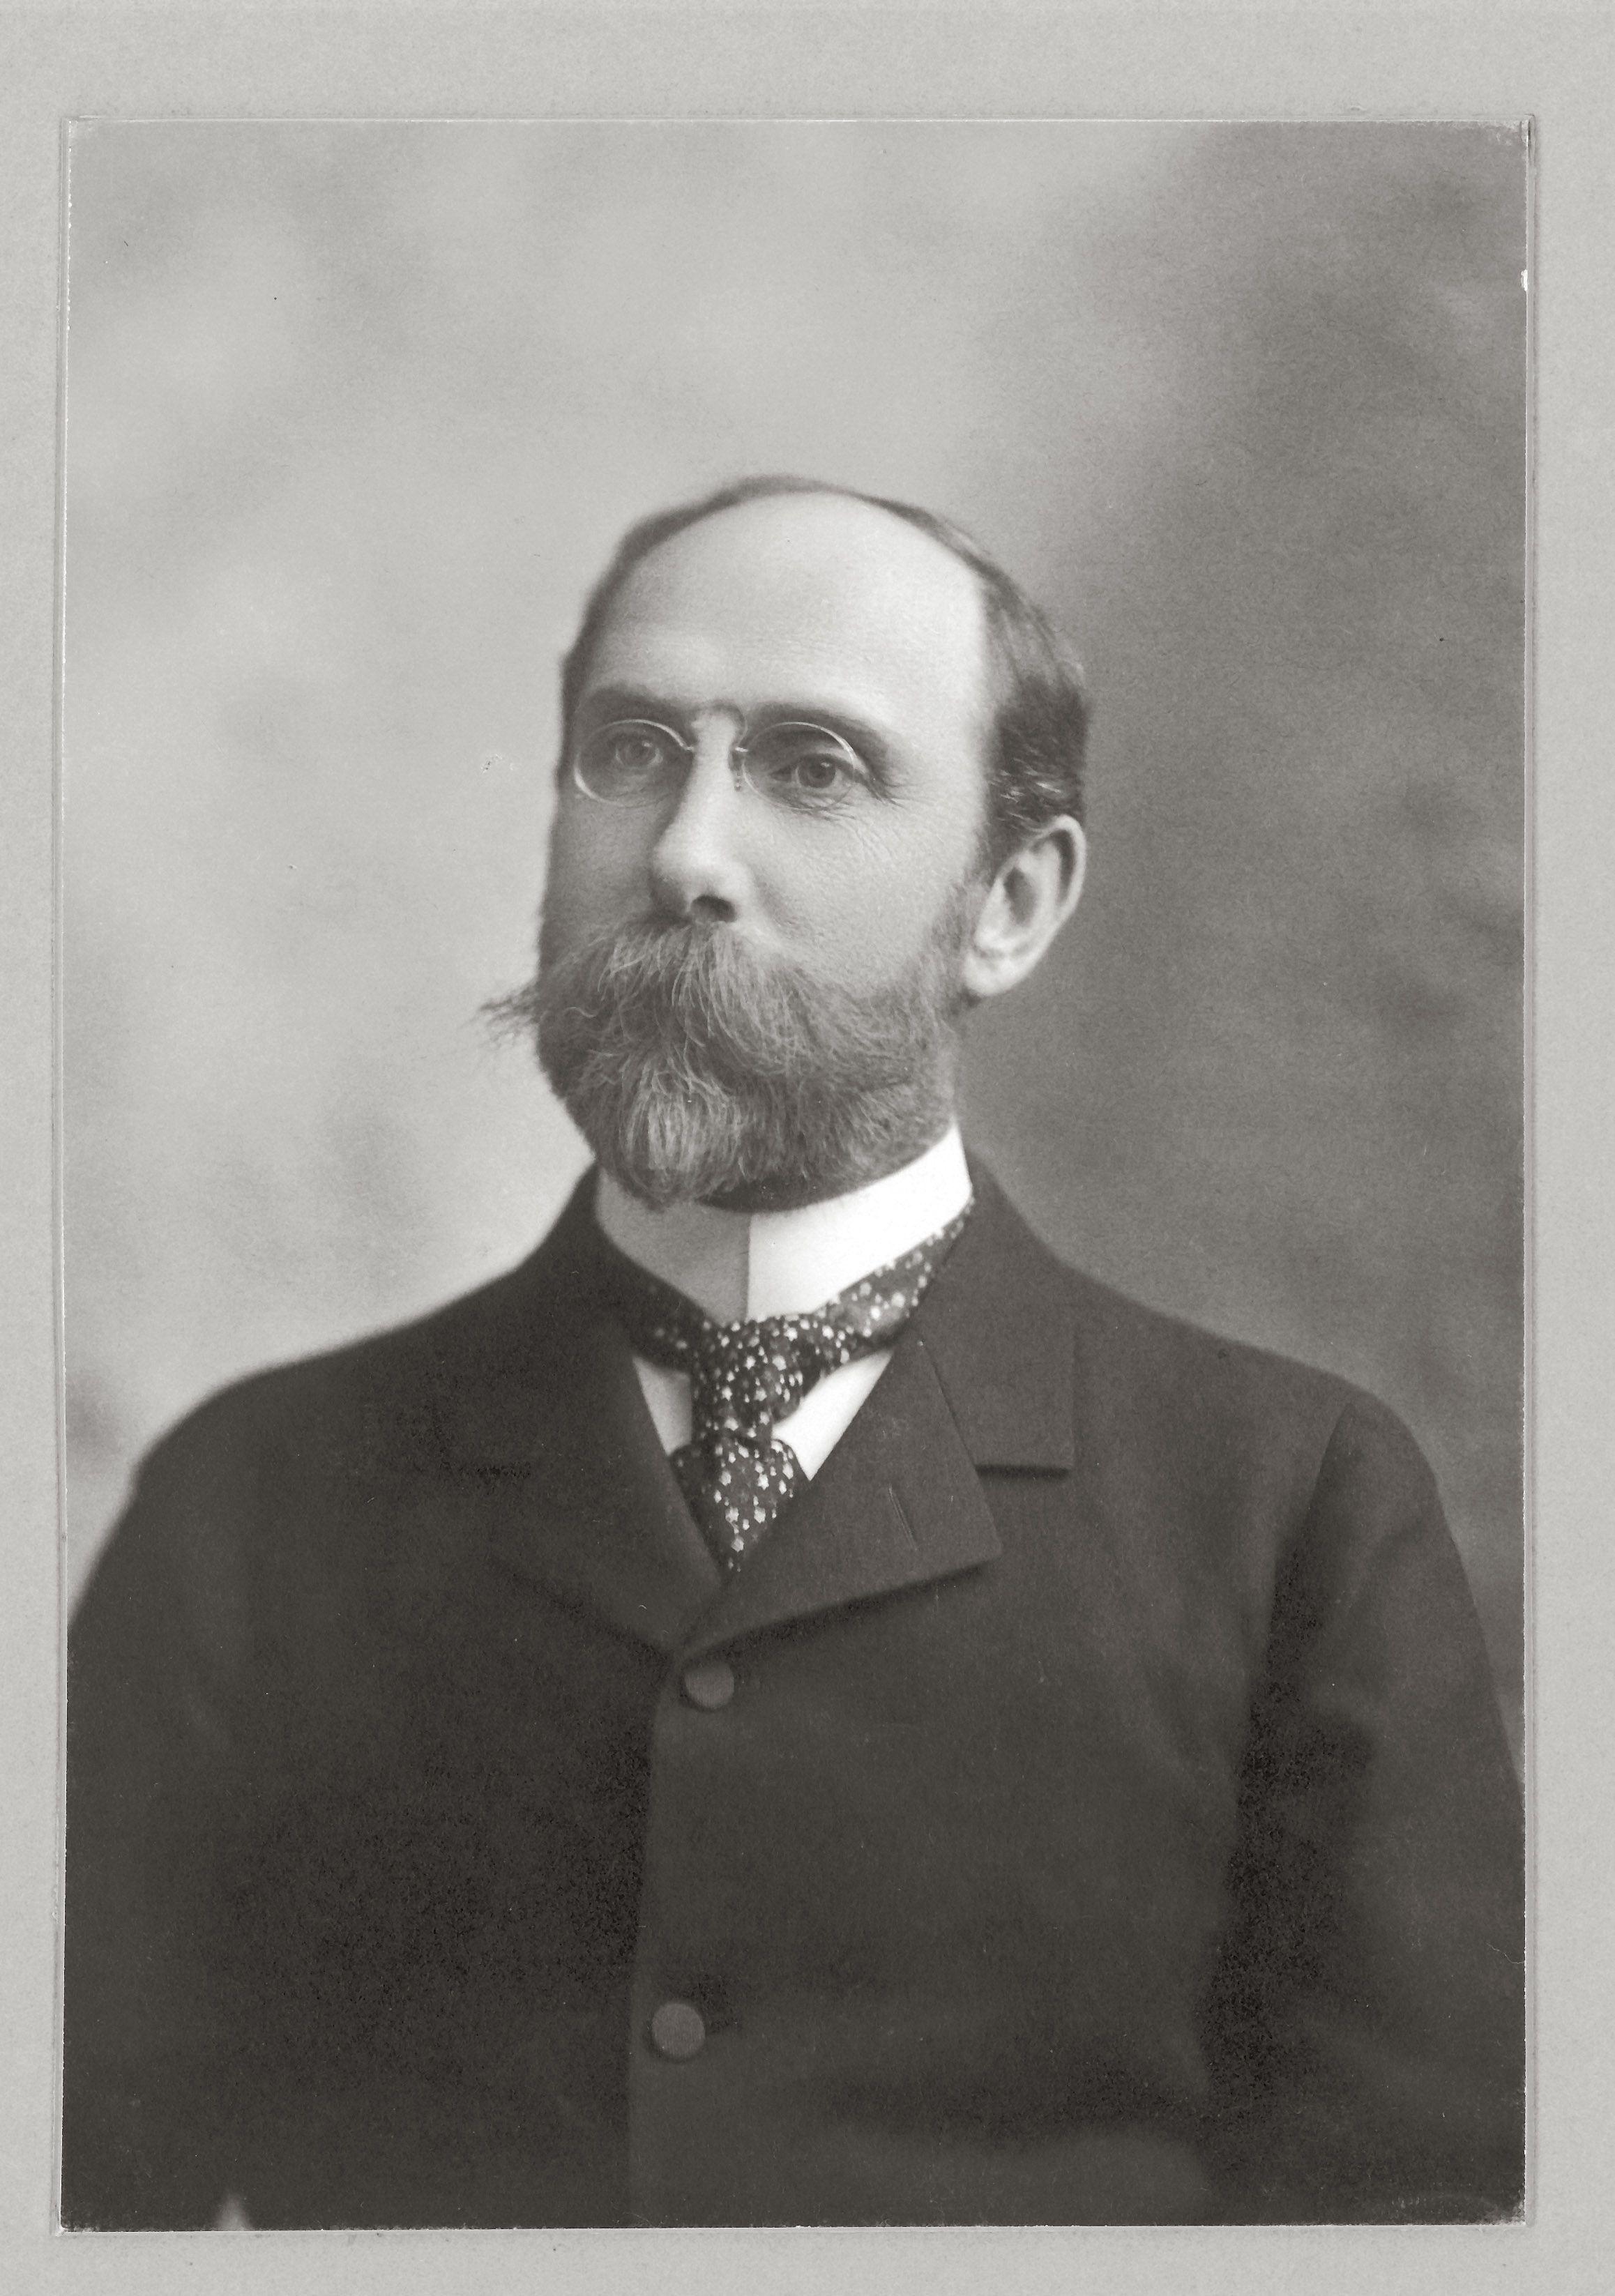 Charles Lang Freer ca. 1905, Charles Lang Freer Papers, Freer Gallery of Art and Arthur M. Sackler Archives.